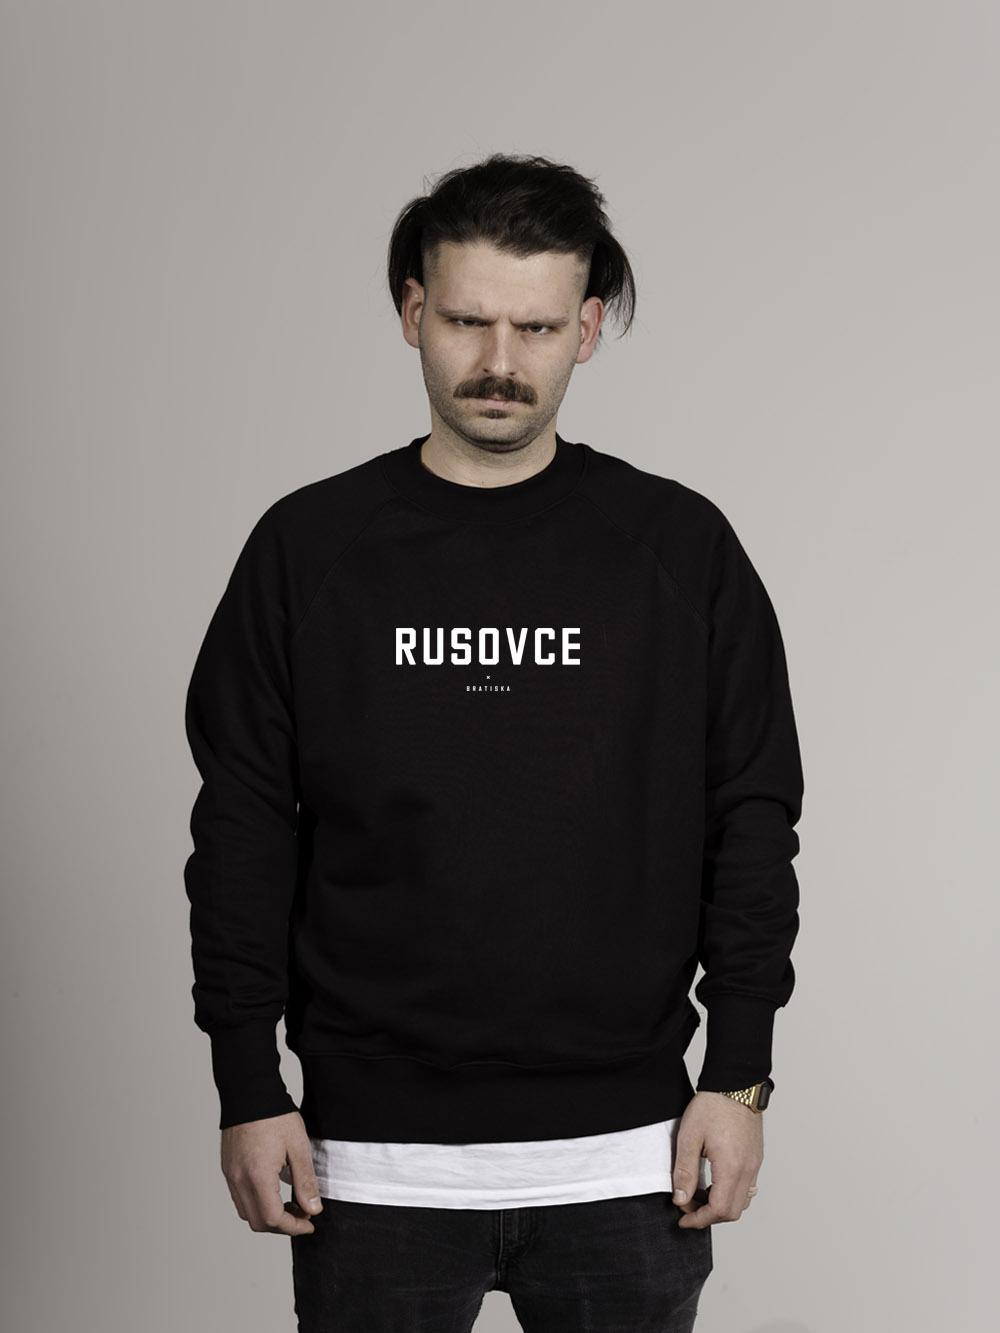 Rusovce